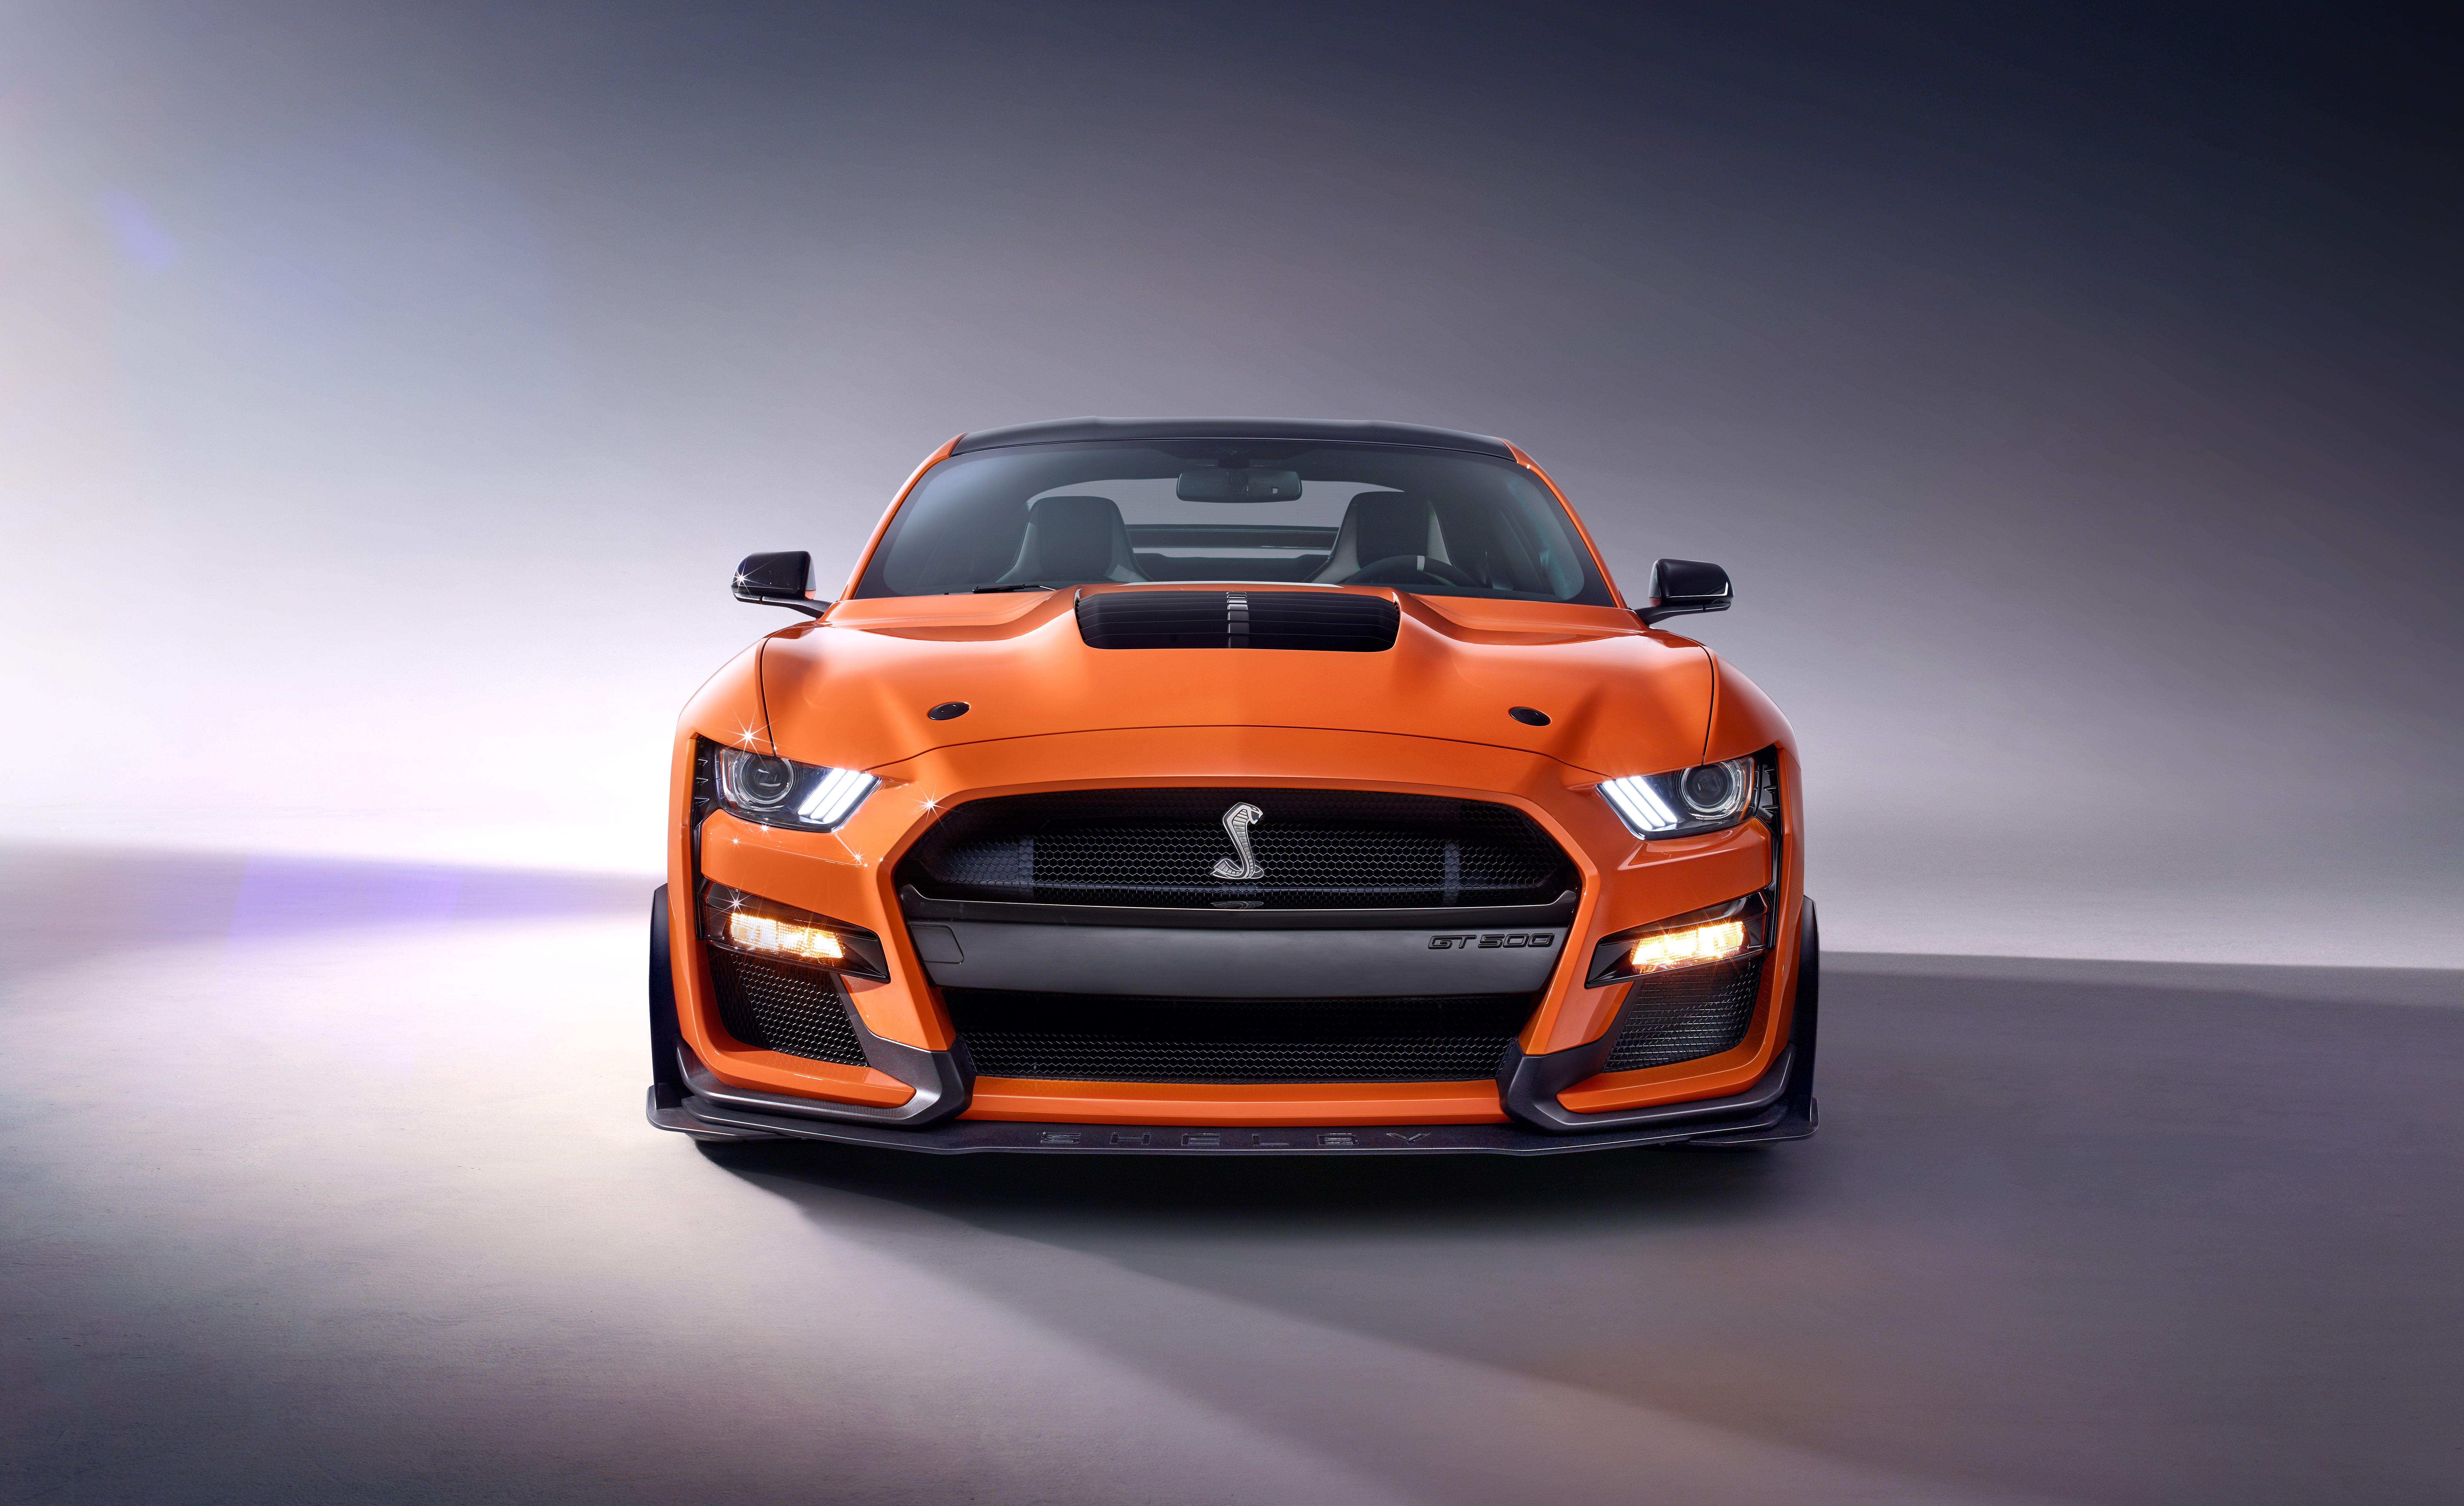 Ford Mustang Cobra Hd Wallpaper